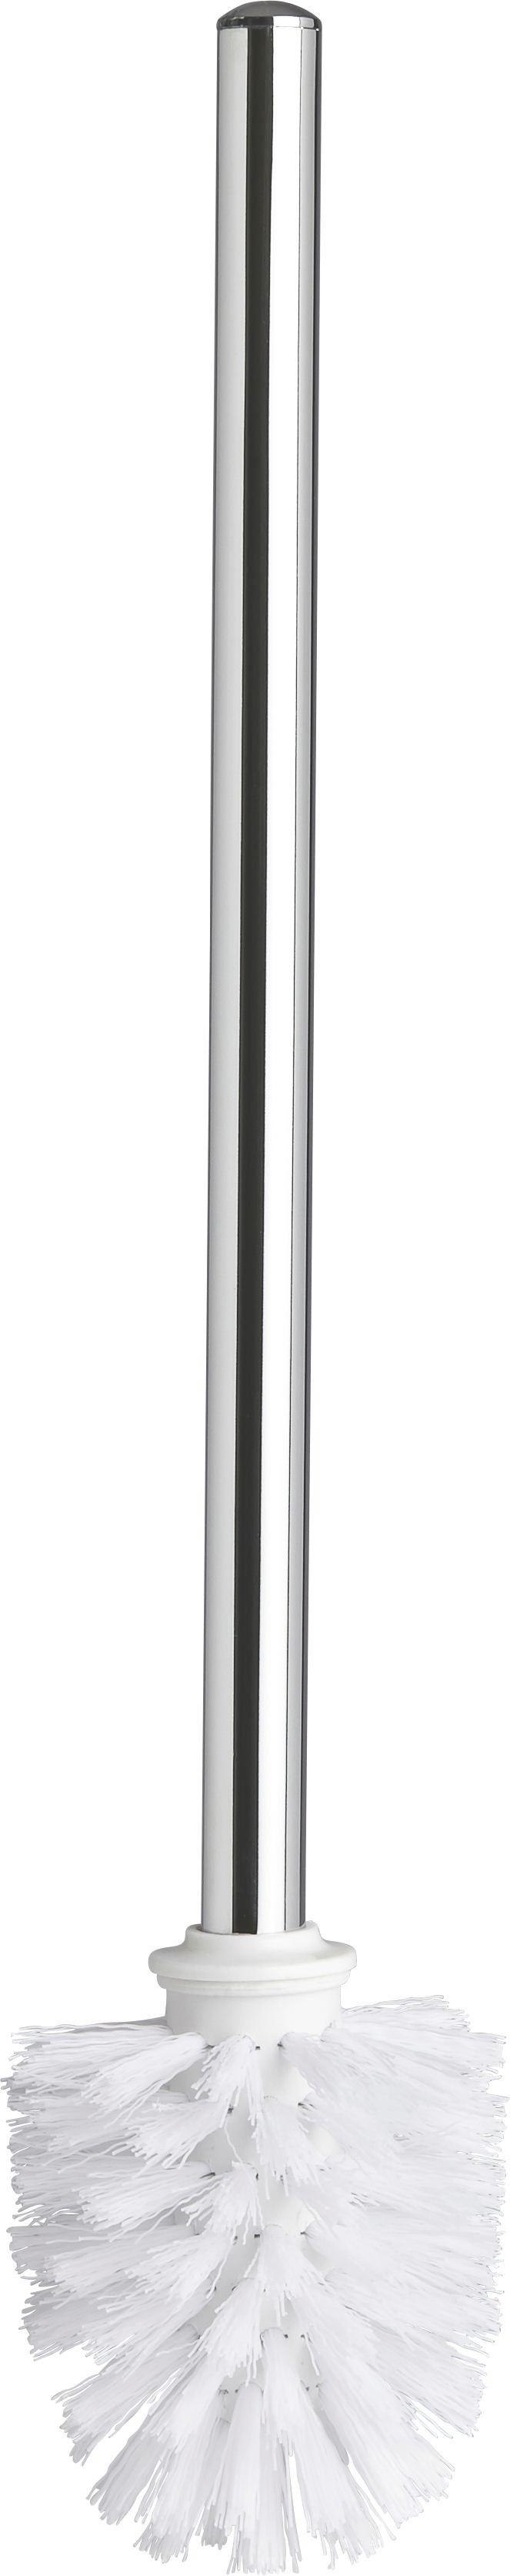 WC-Bürste Vision in Chrom/Weiß - Kunststoff/Metall (8/37,5cm) - MÖMAX modern living